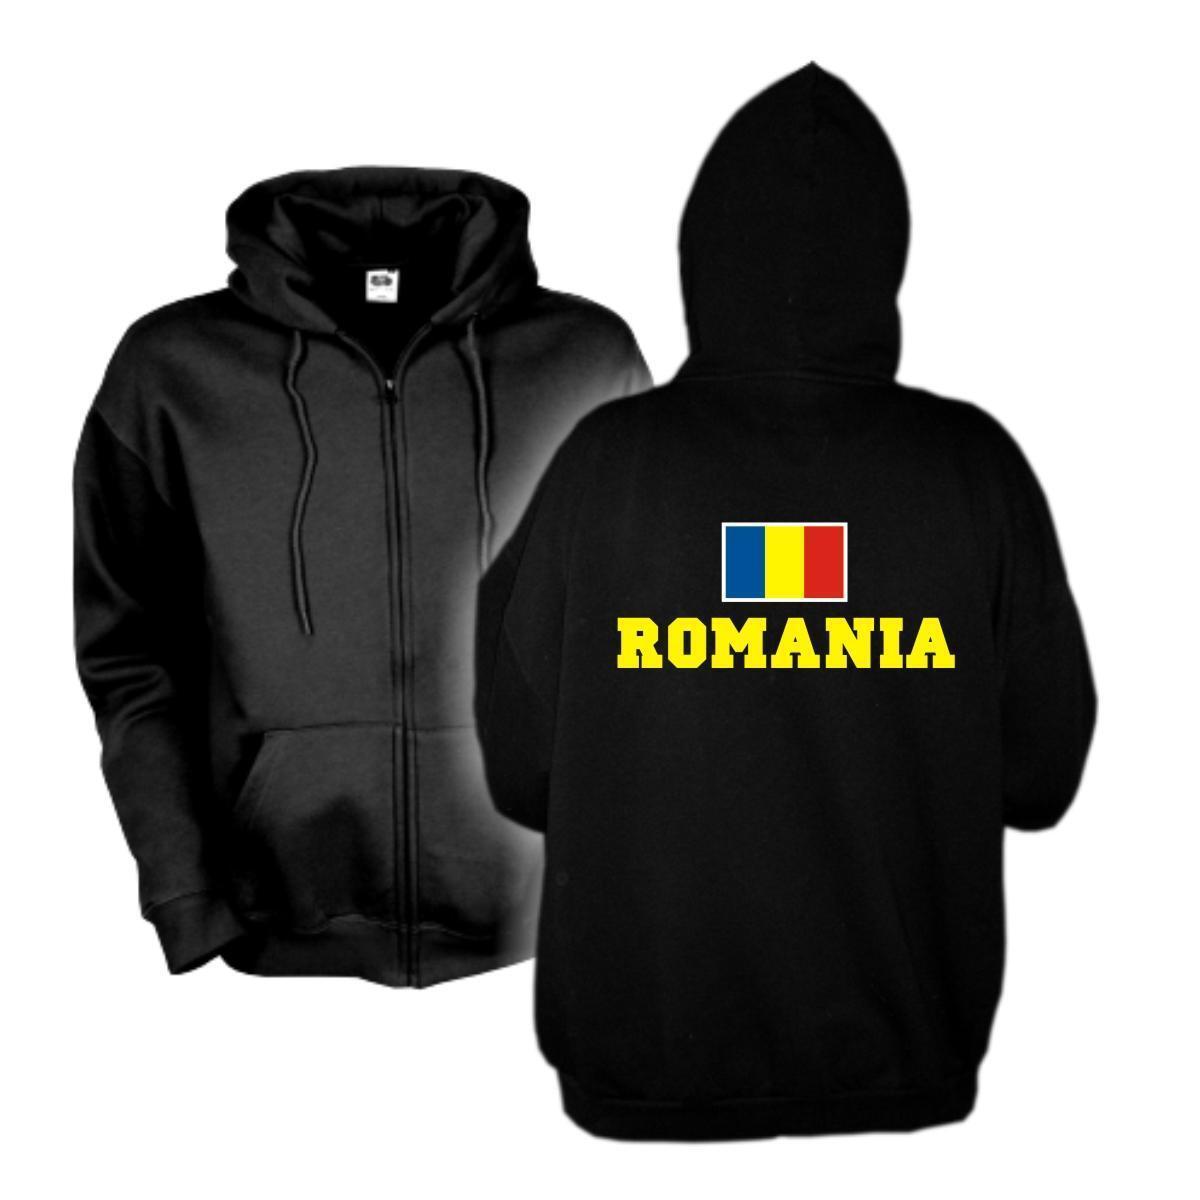 Kapuzenjacke RUMÄNIEN Romania Flagshirt Zip Hoodie Sweatjacke S-6XL (WMS02-51e)